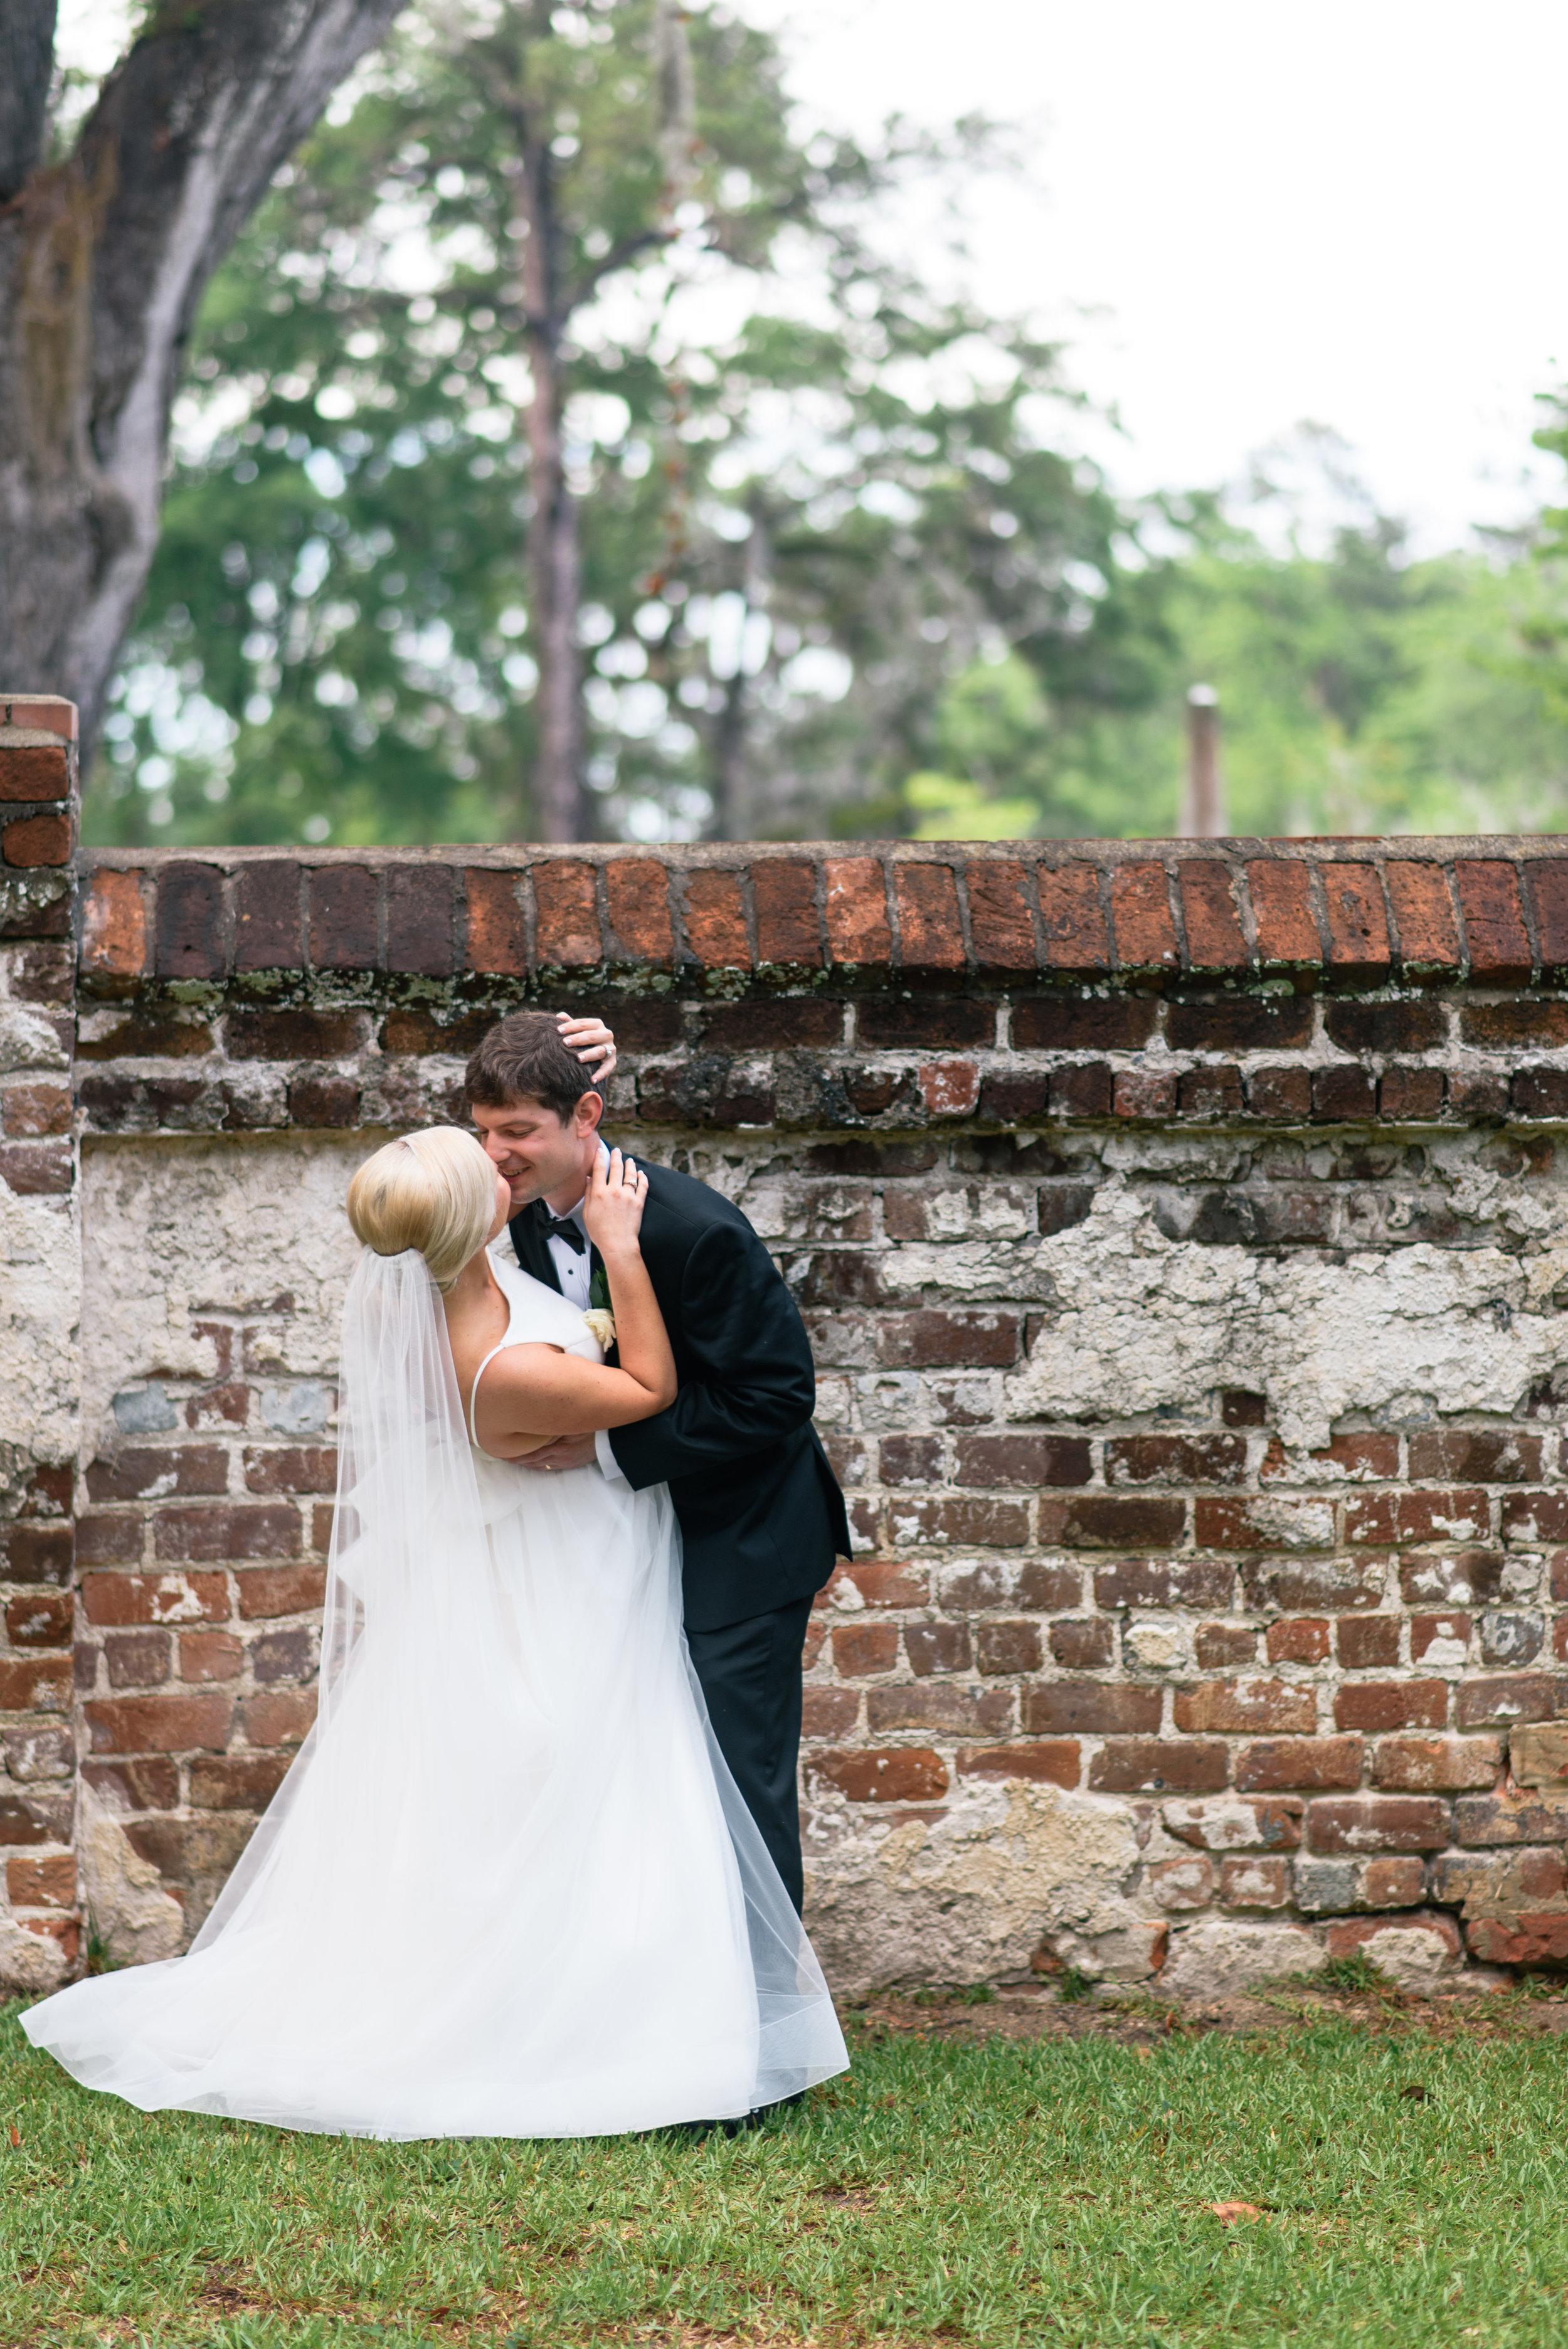 ali-and-jared-savannah-georgia-may-2017-wedding-meg-hill-photo-(495of760).jpg